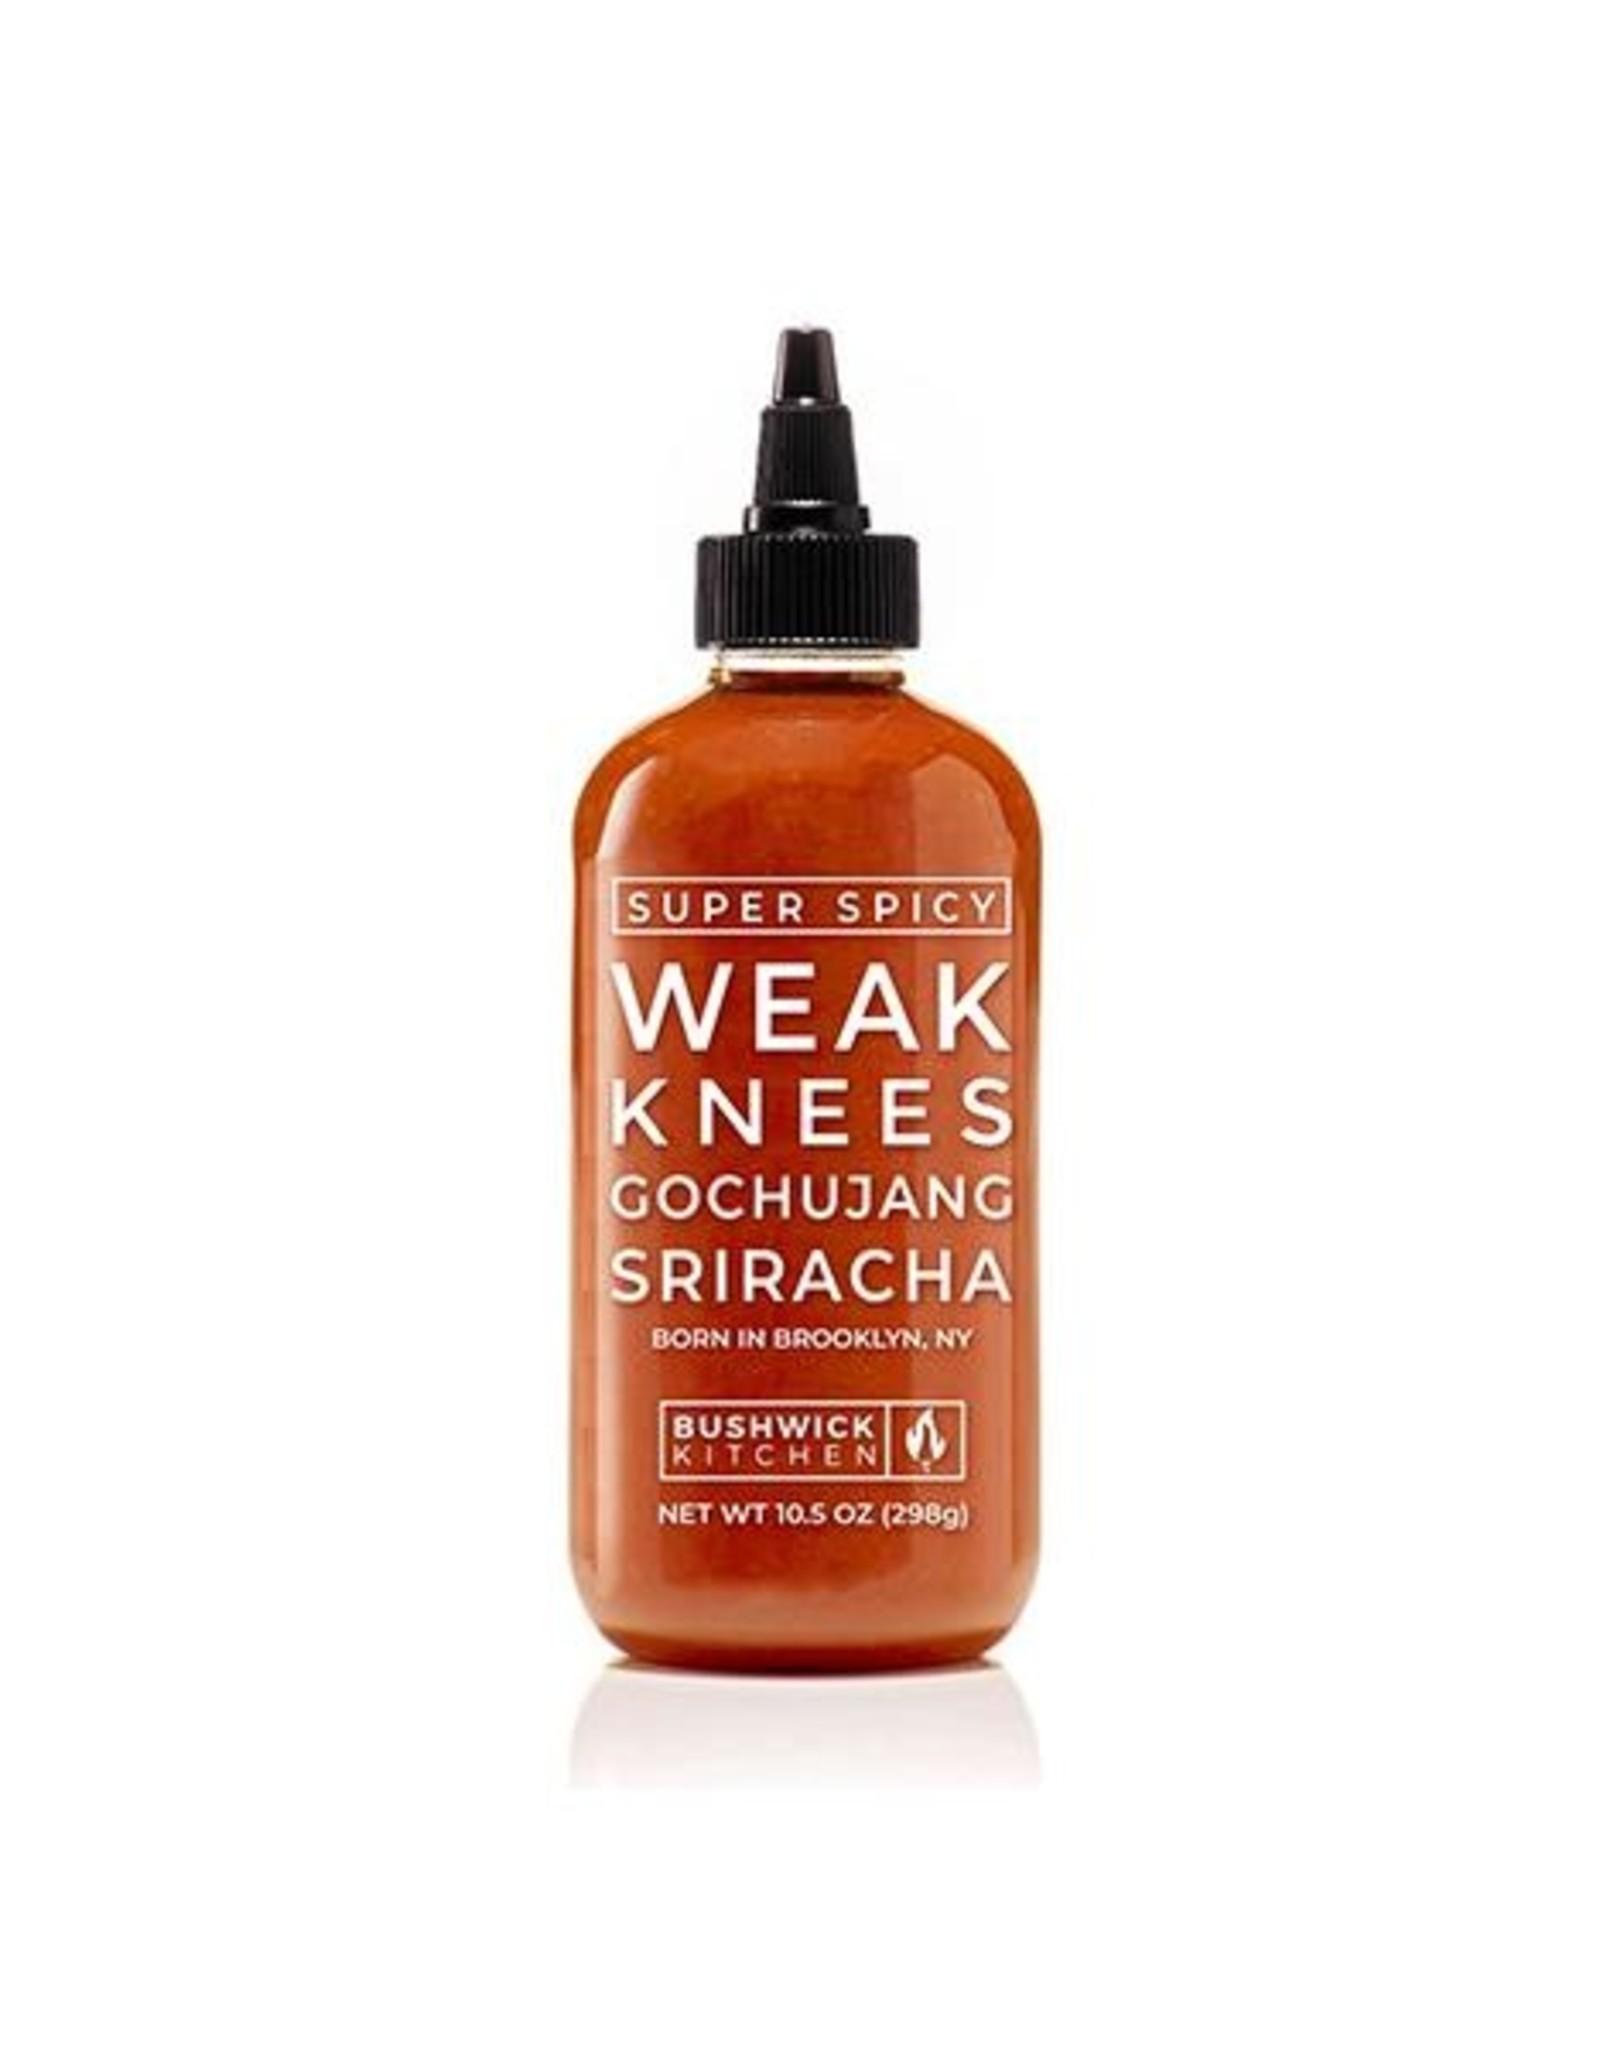 Bushwick Kitchen Bushwick Kitchen  Weak Knees Super Spicy Gochujang Sriracha